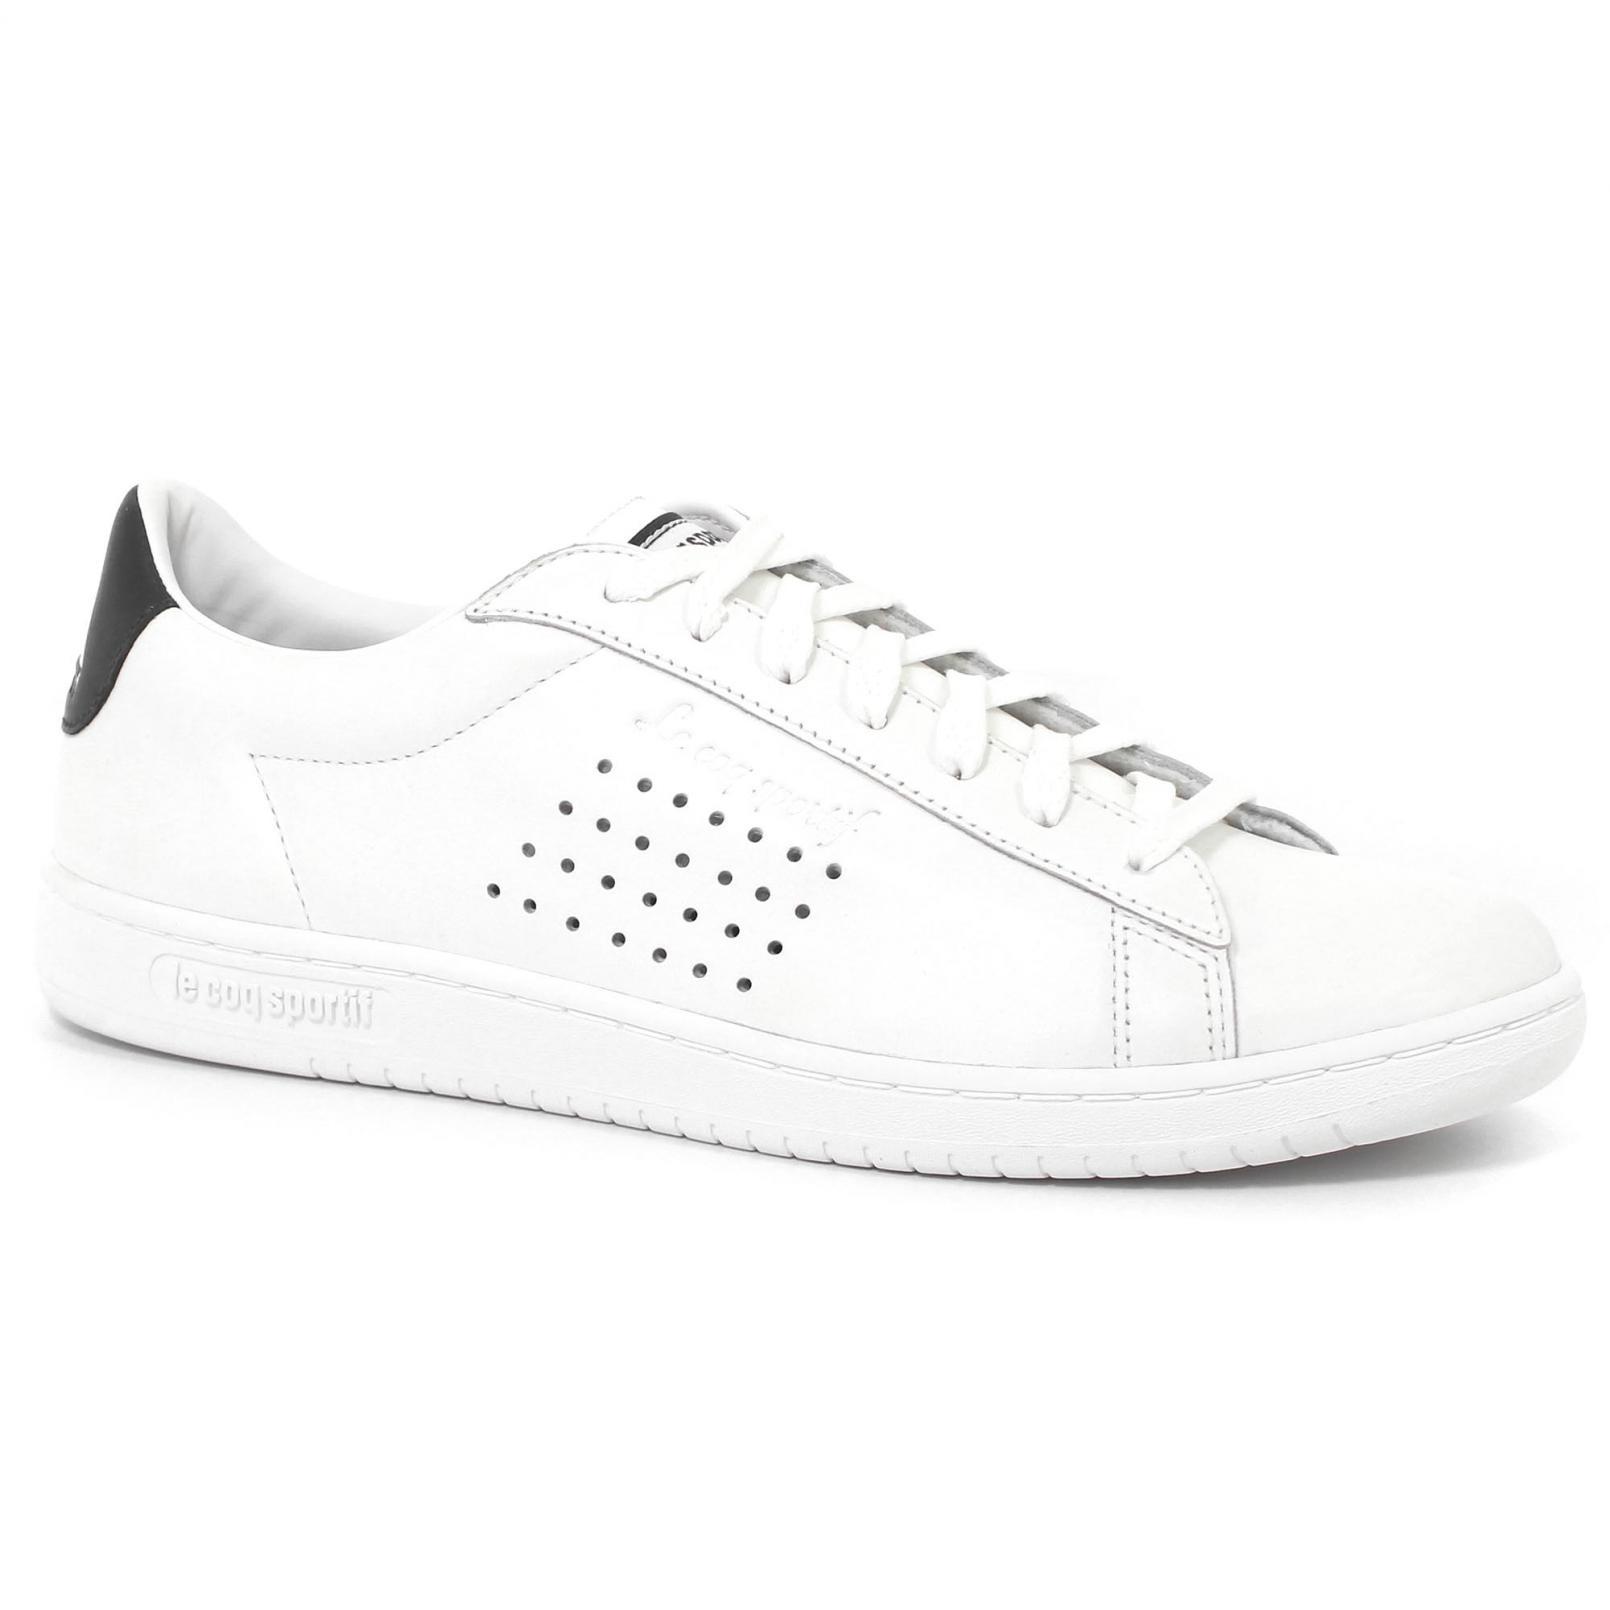 Shoes – Le Coq Sportif Arthur Ashe Lea White/Green